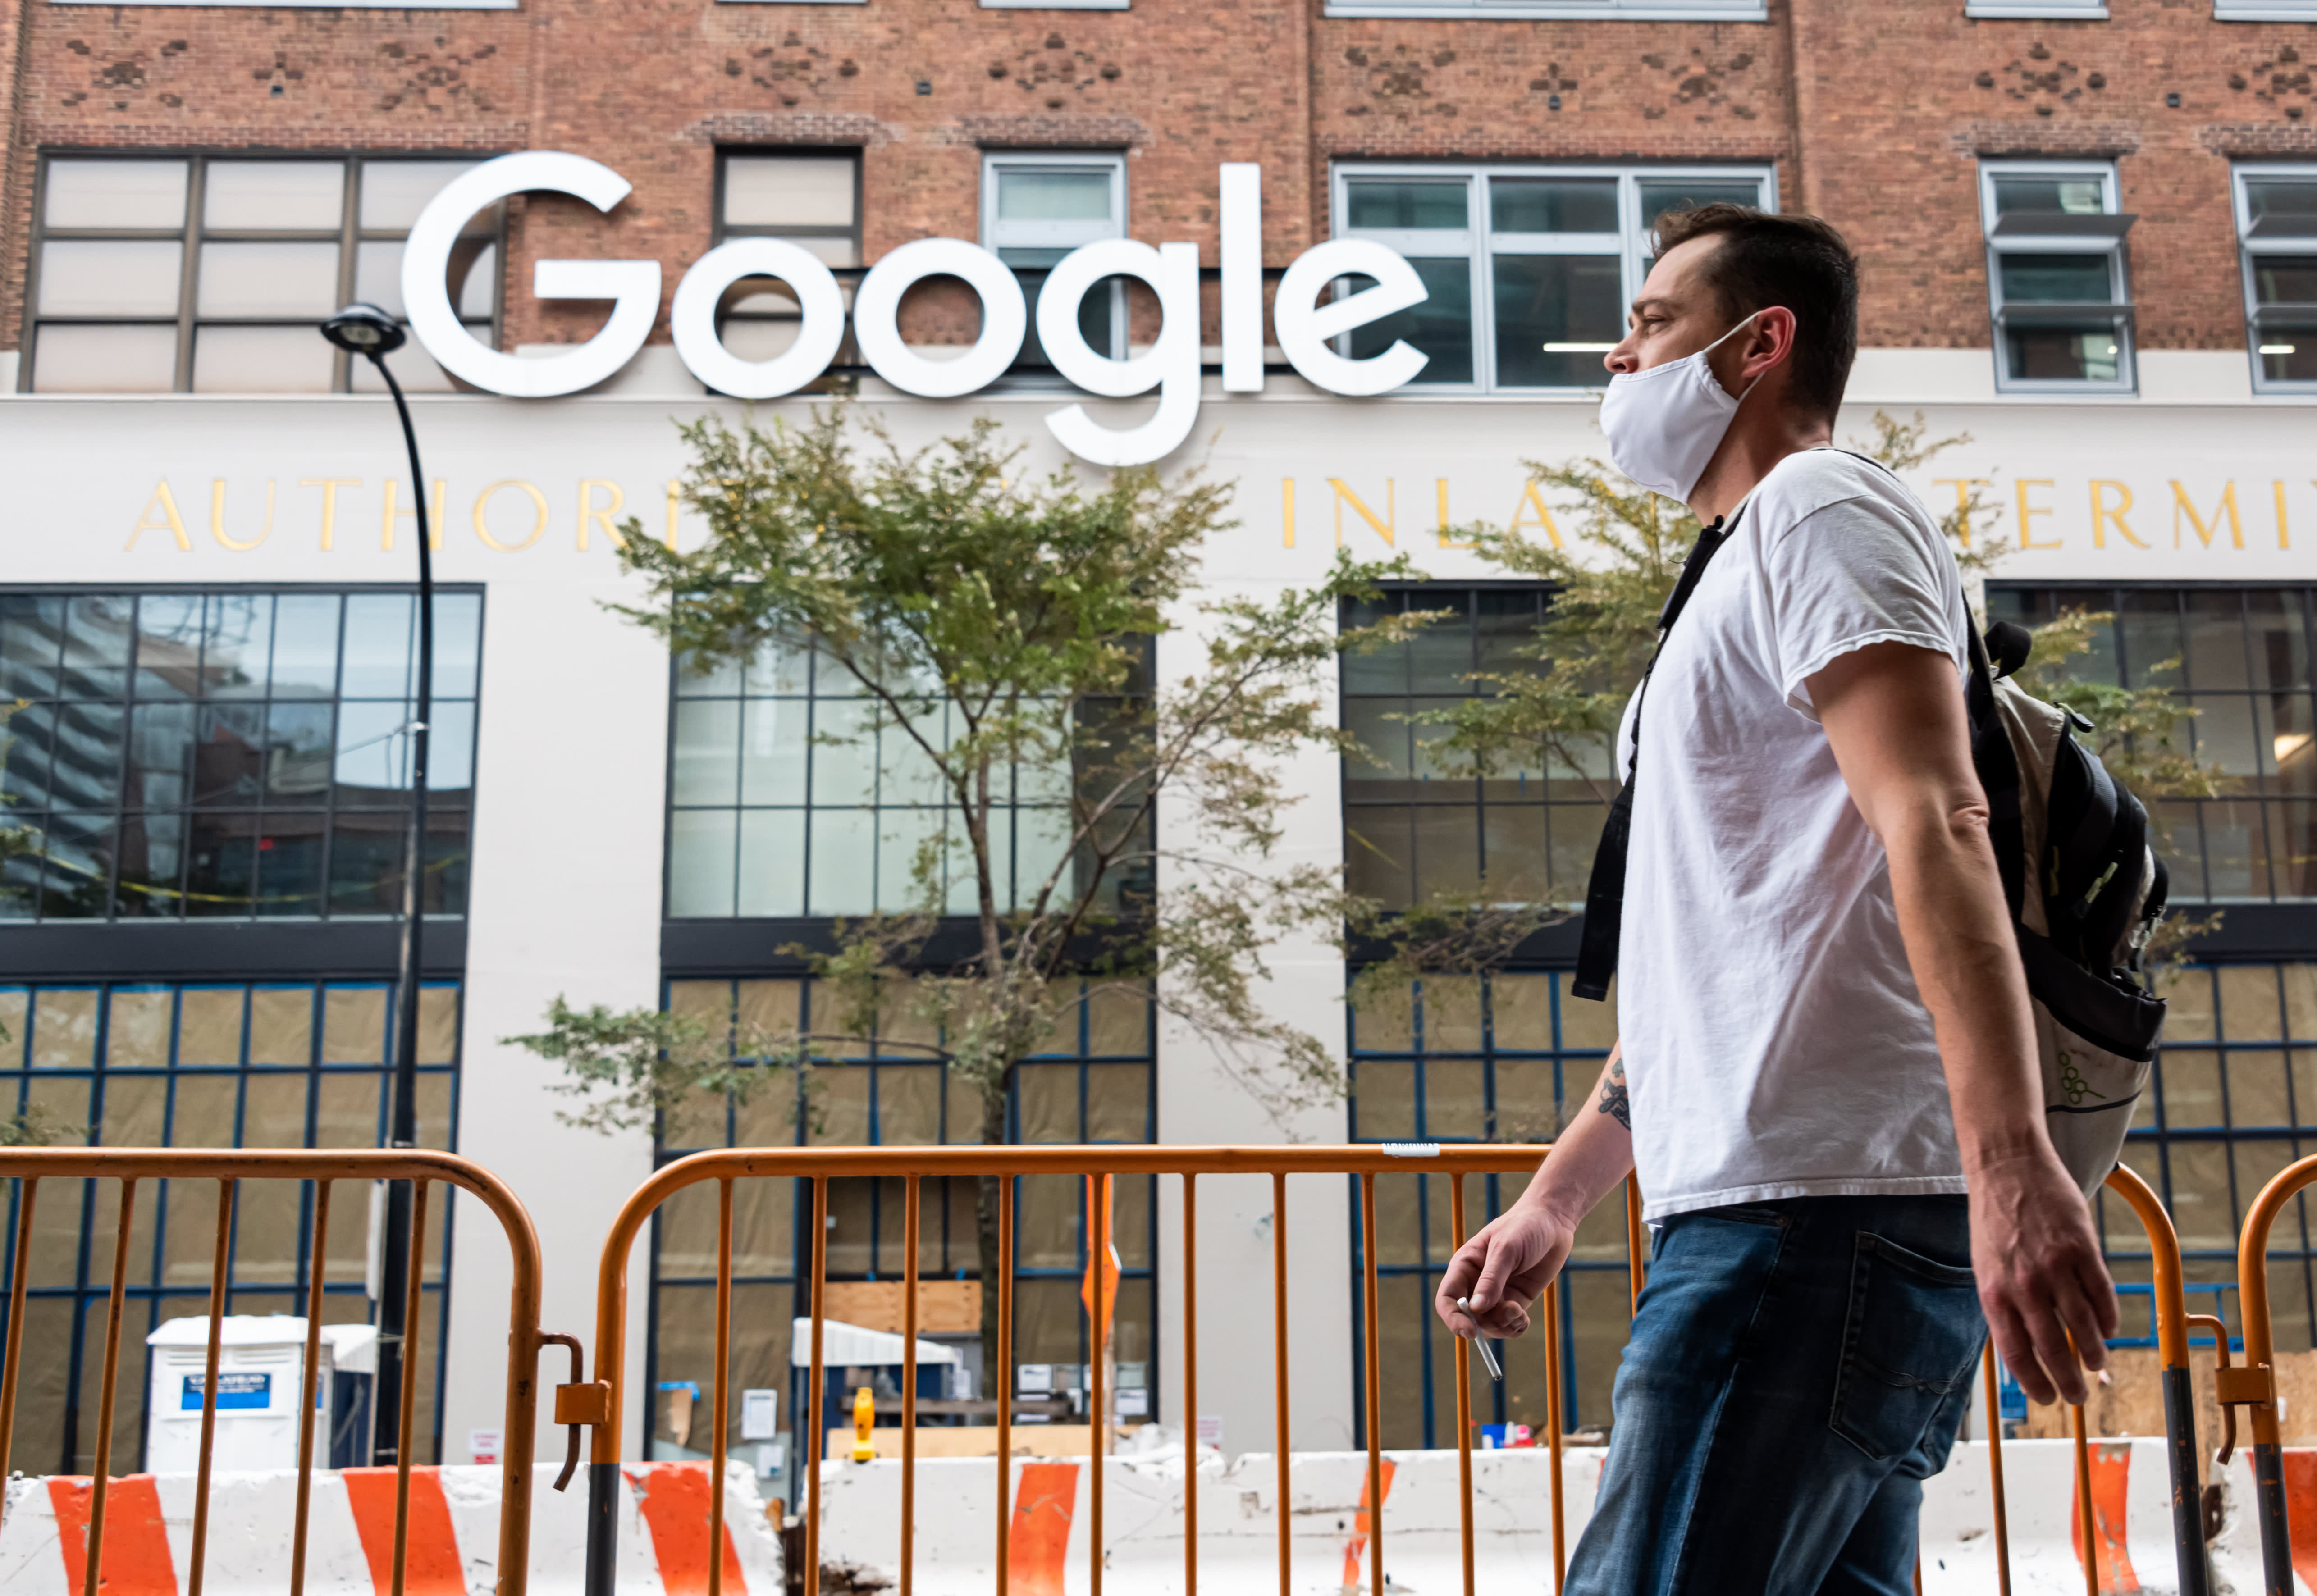 Google postpones return to work until October, will require vaccinations - CNBC